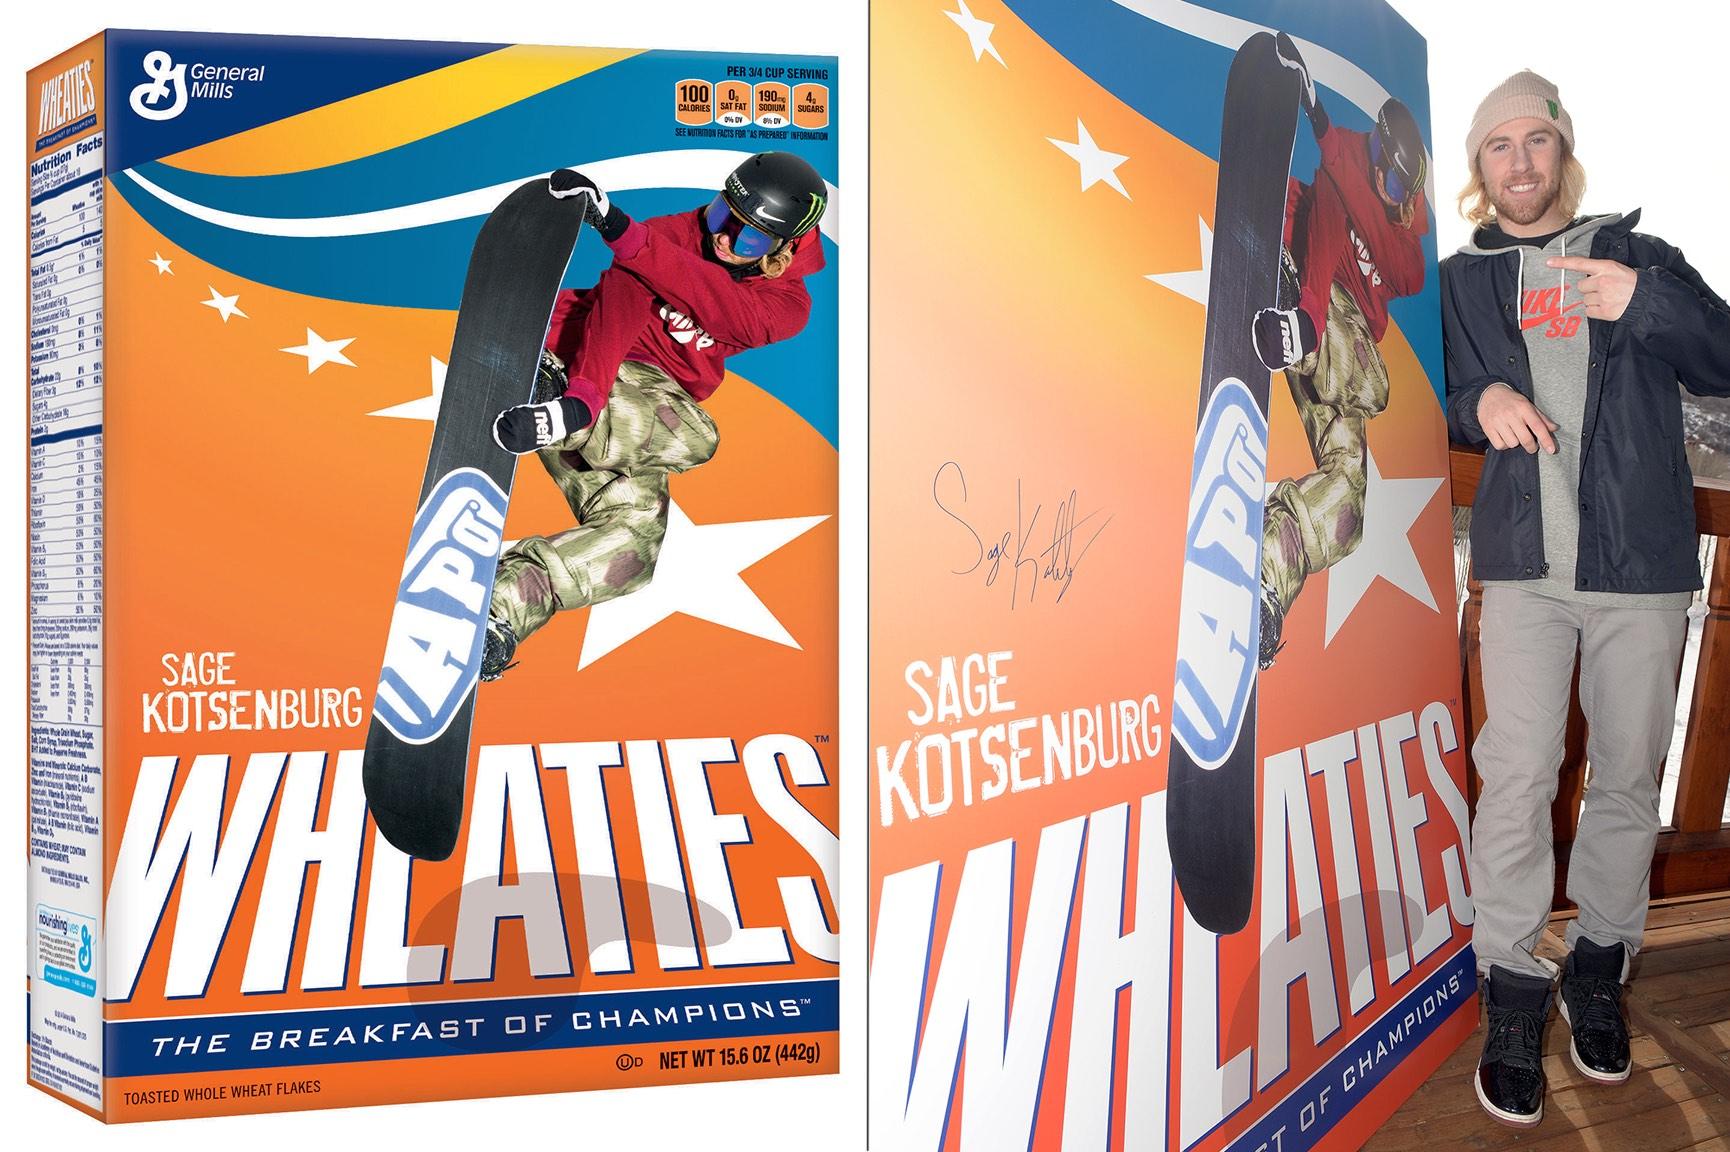 Sage Kotsenburg, Snowboard Slopestyle